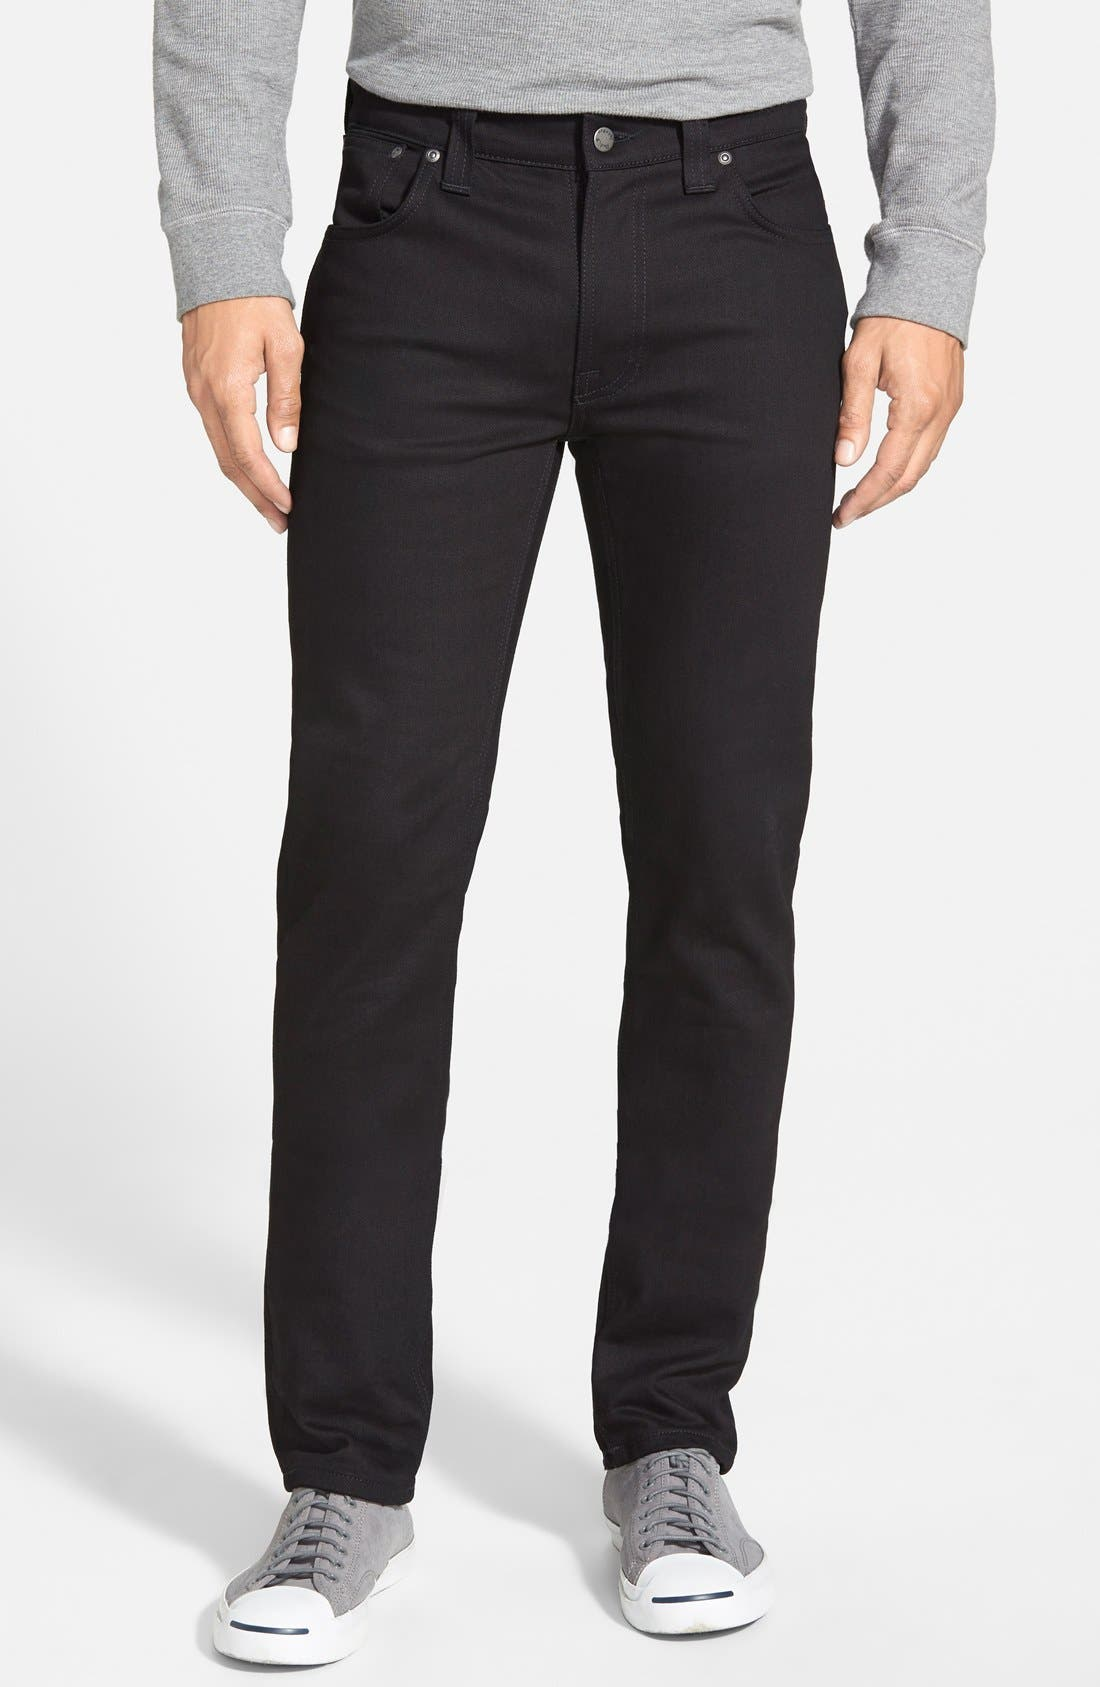 Main Image - Nudie Jeans 'Thin Finn' Skinny Fit Jeans (Black Ring)